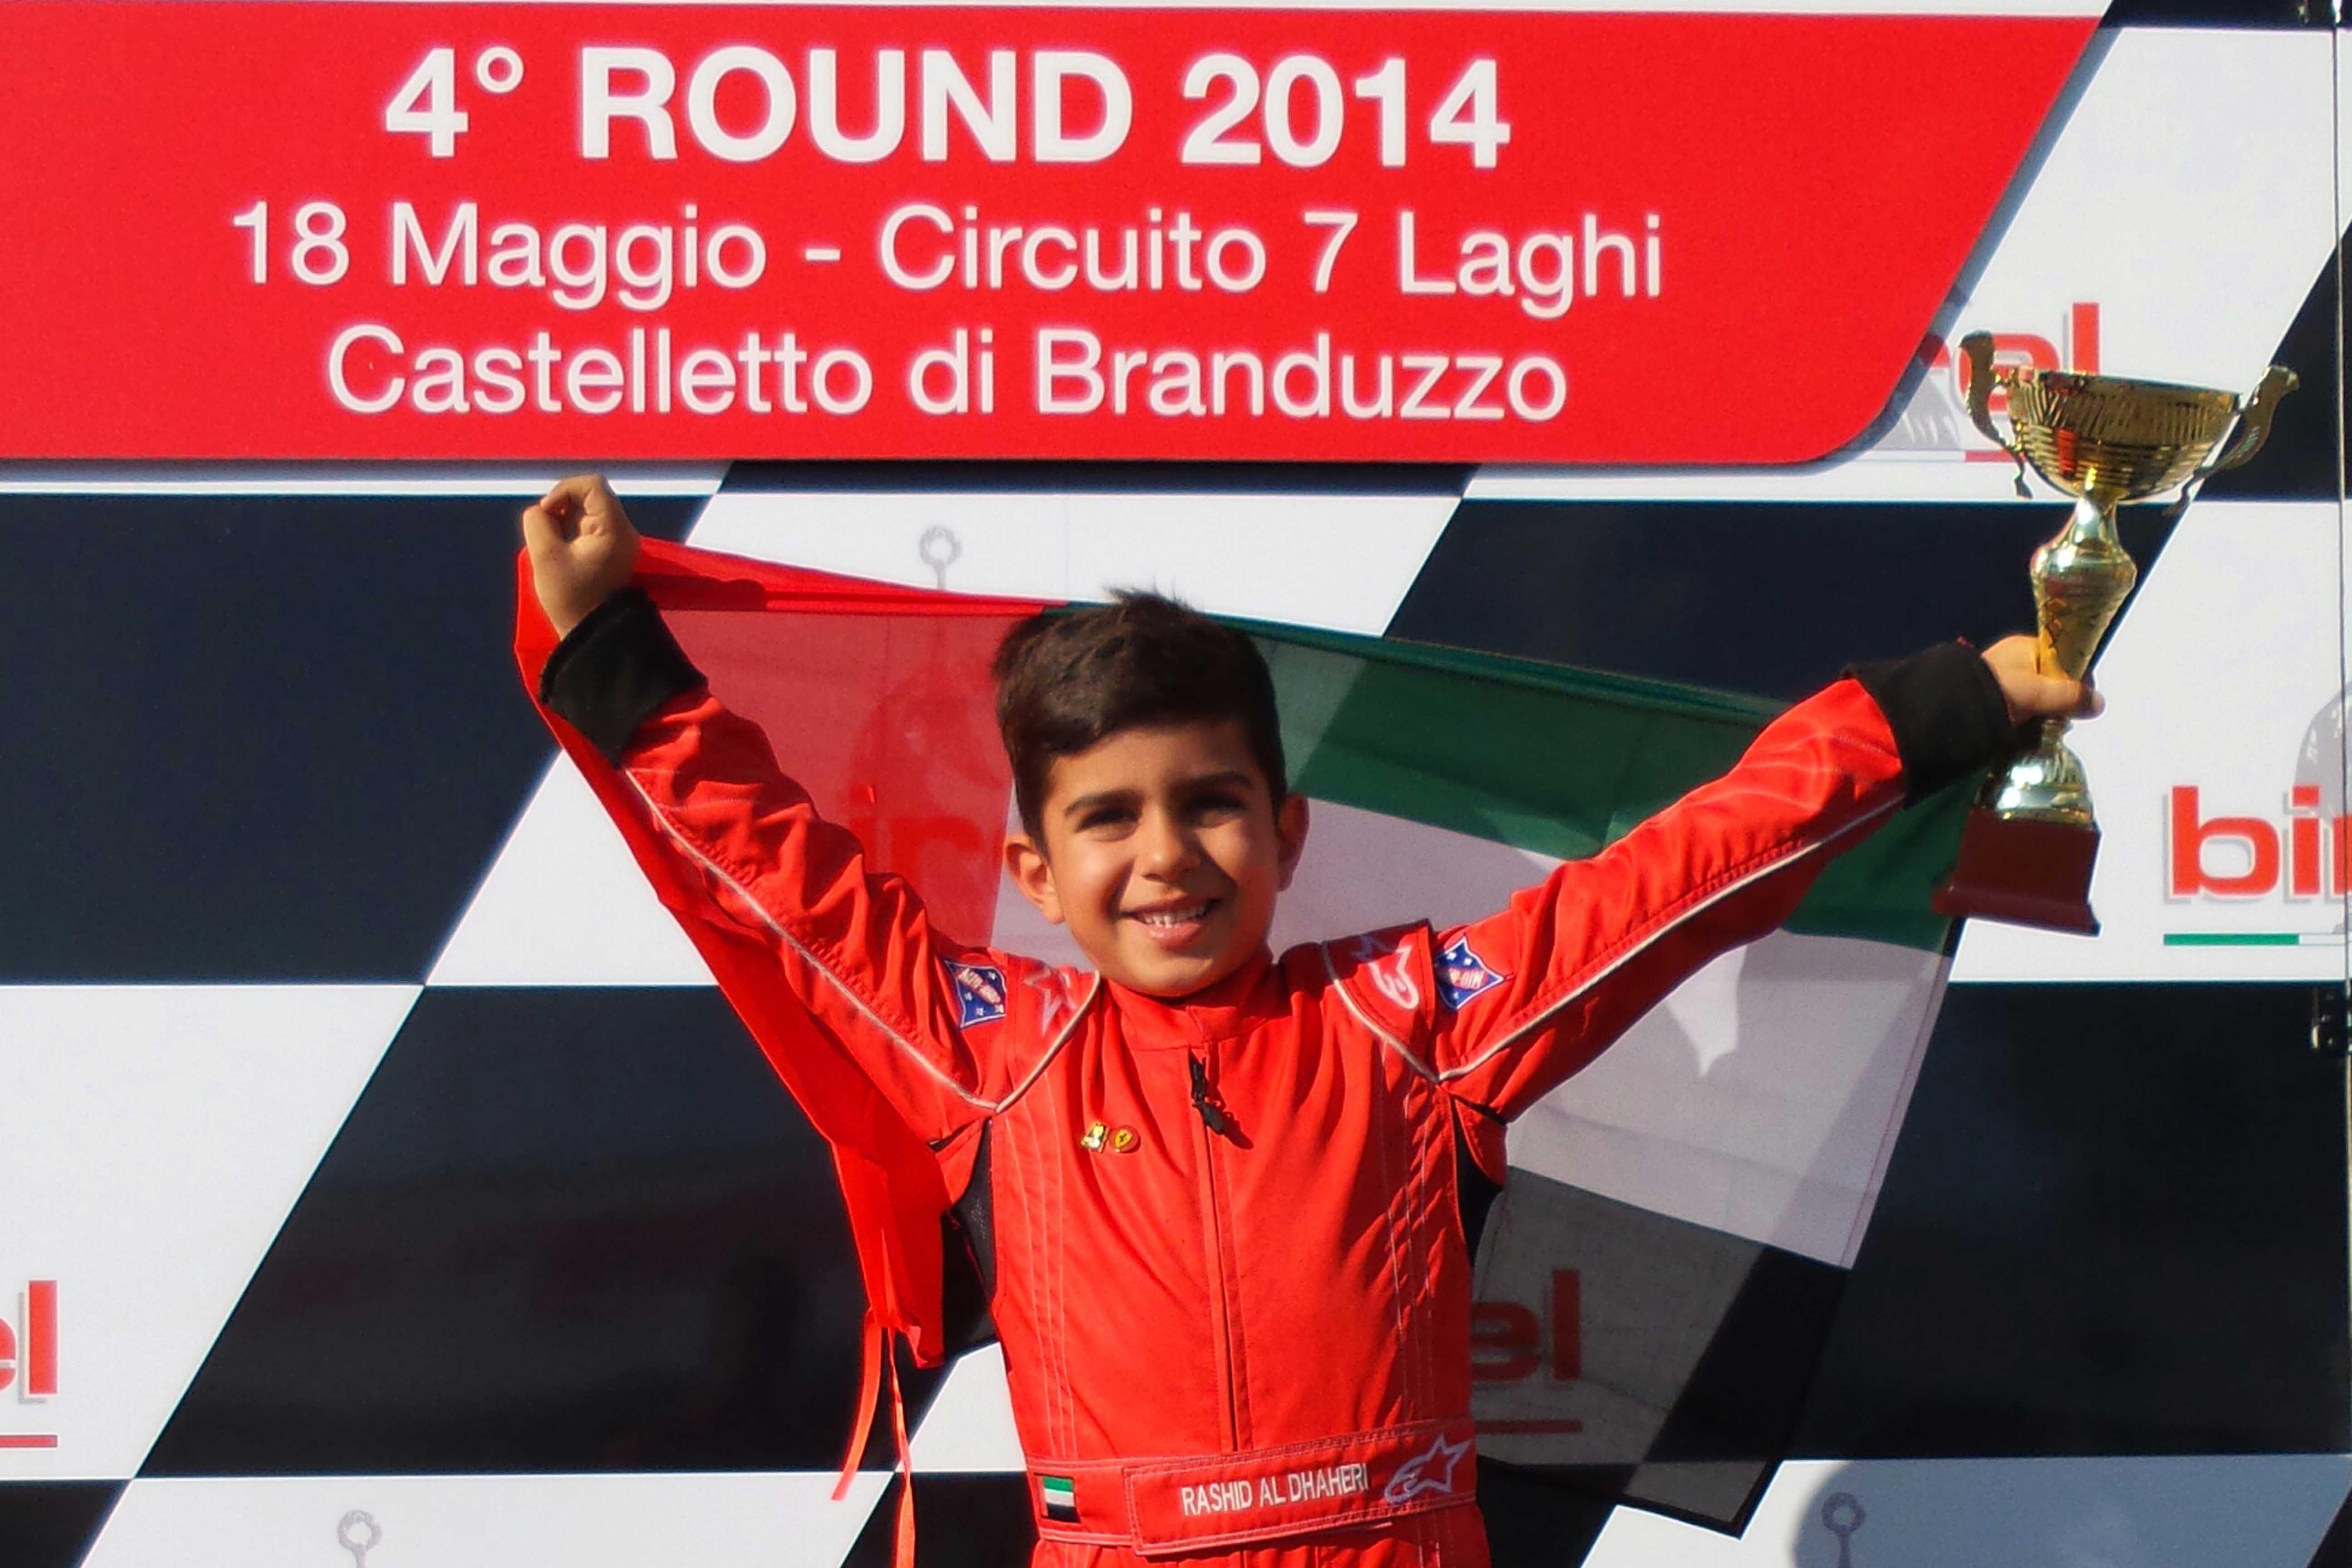 Karting Dubai: Rashid Al Dhaheri makes history in Italy